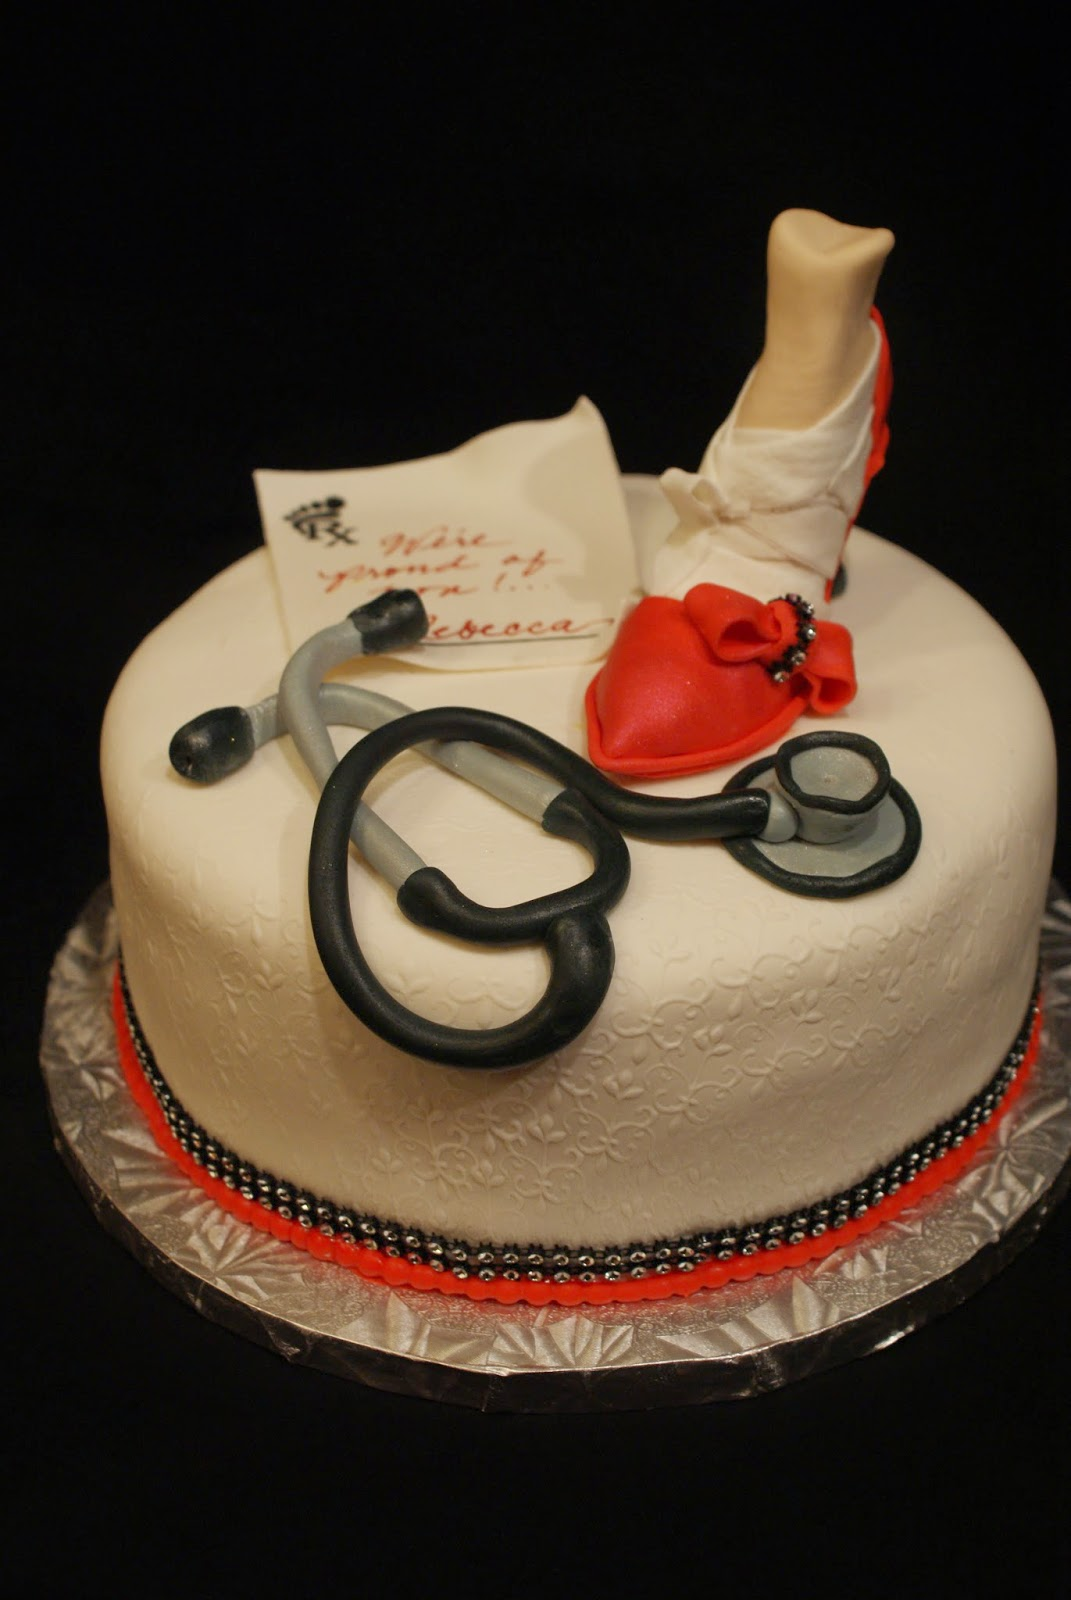 A keen cake impression august 2012 - Impression gateau ...